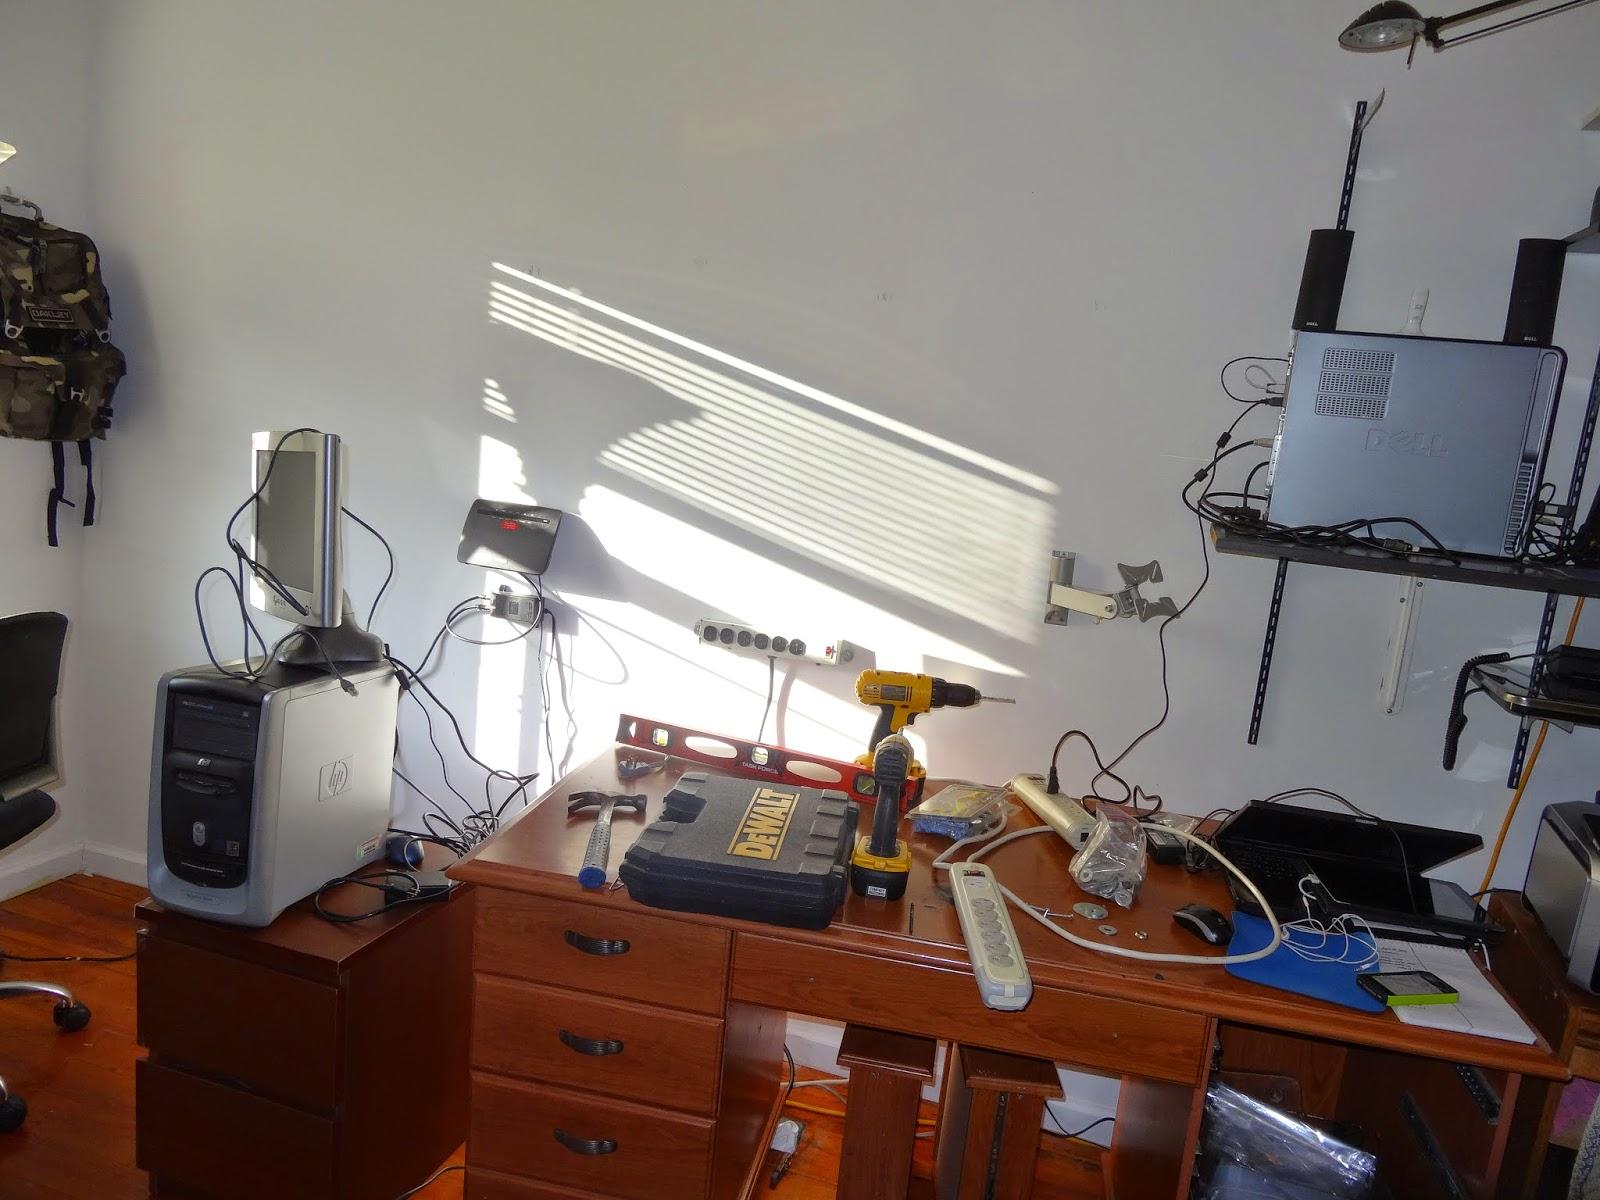 Checking Reality: eBay Office Setup + Packing Area + Photo